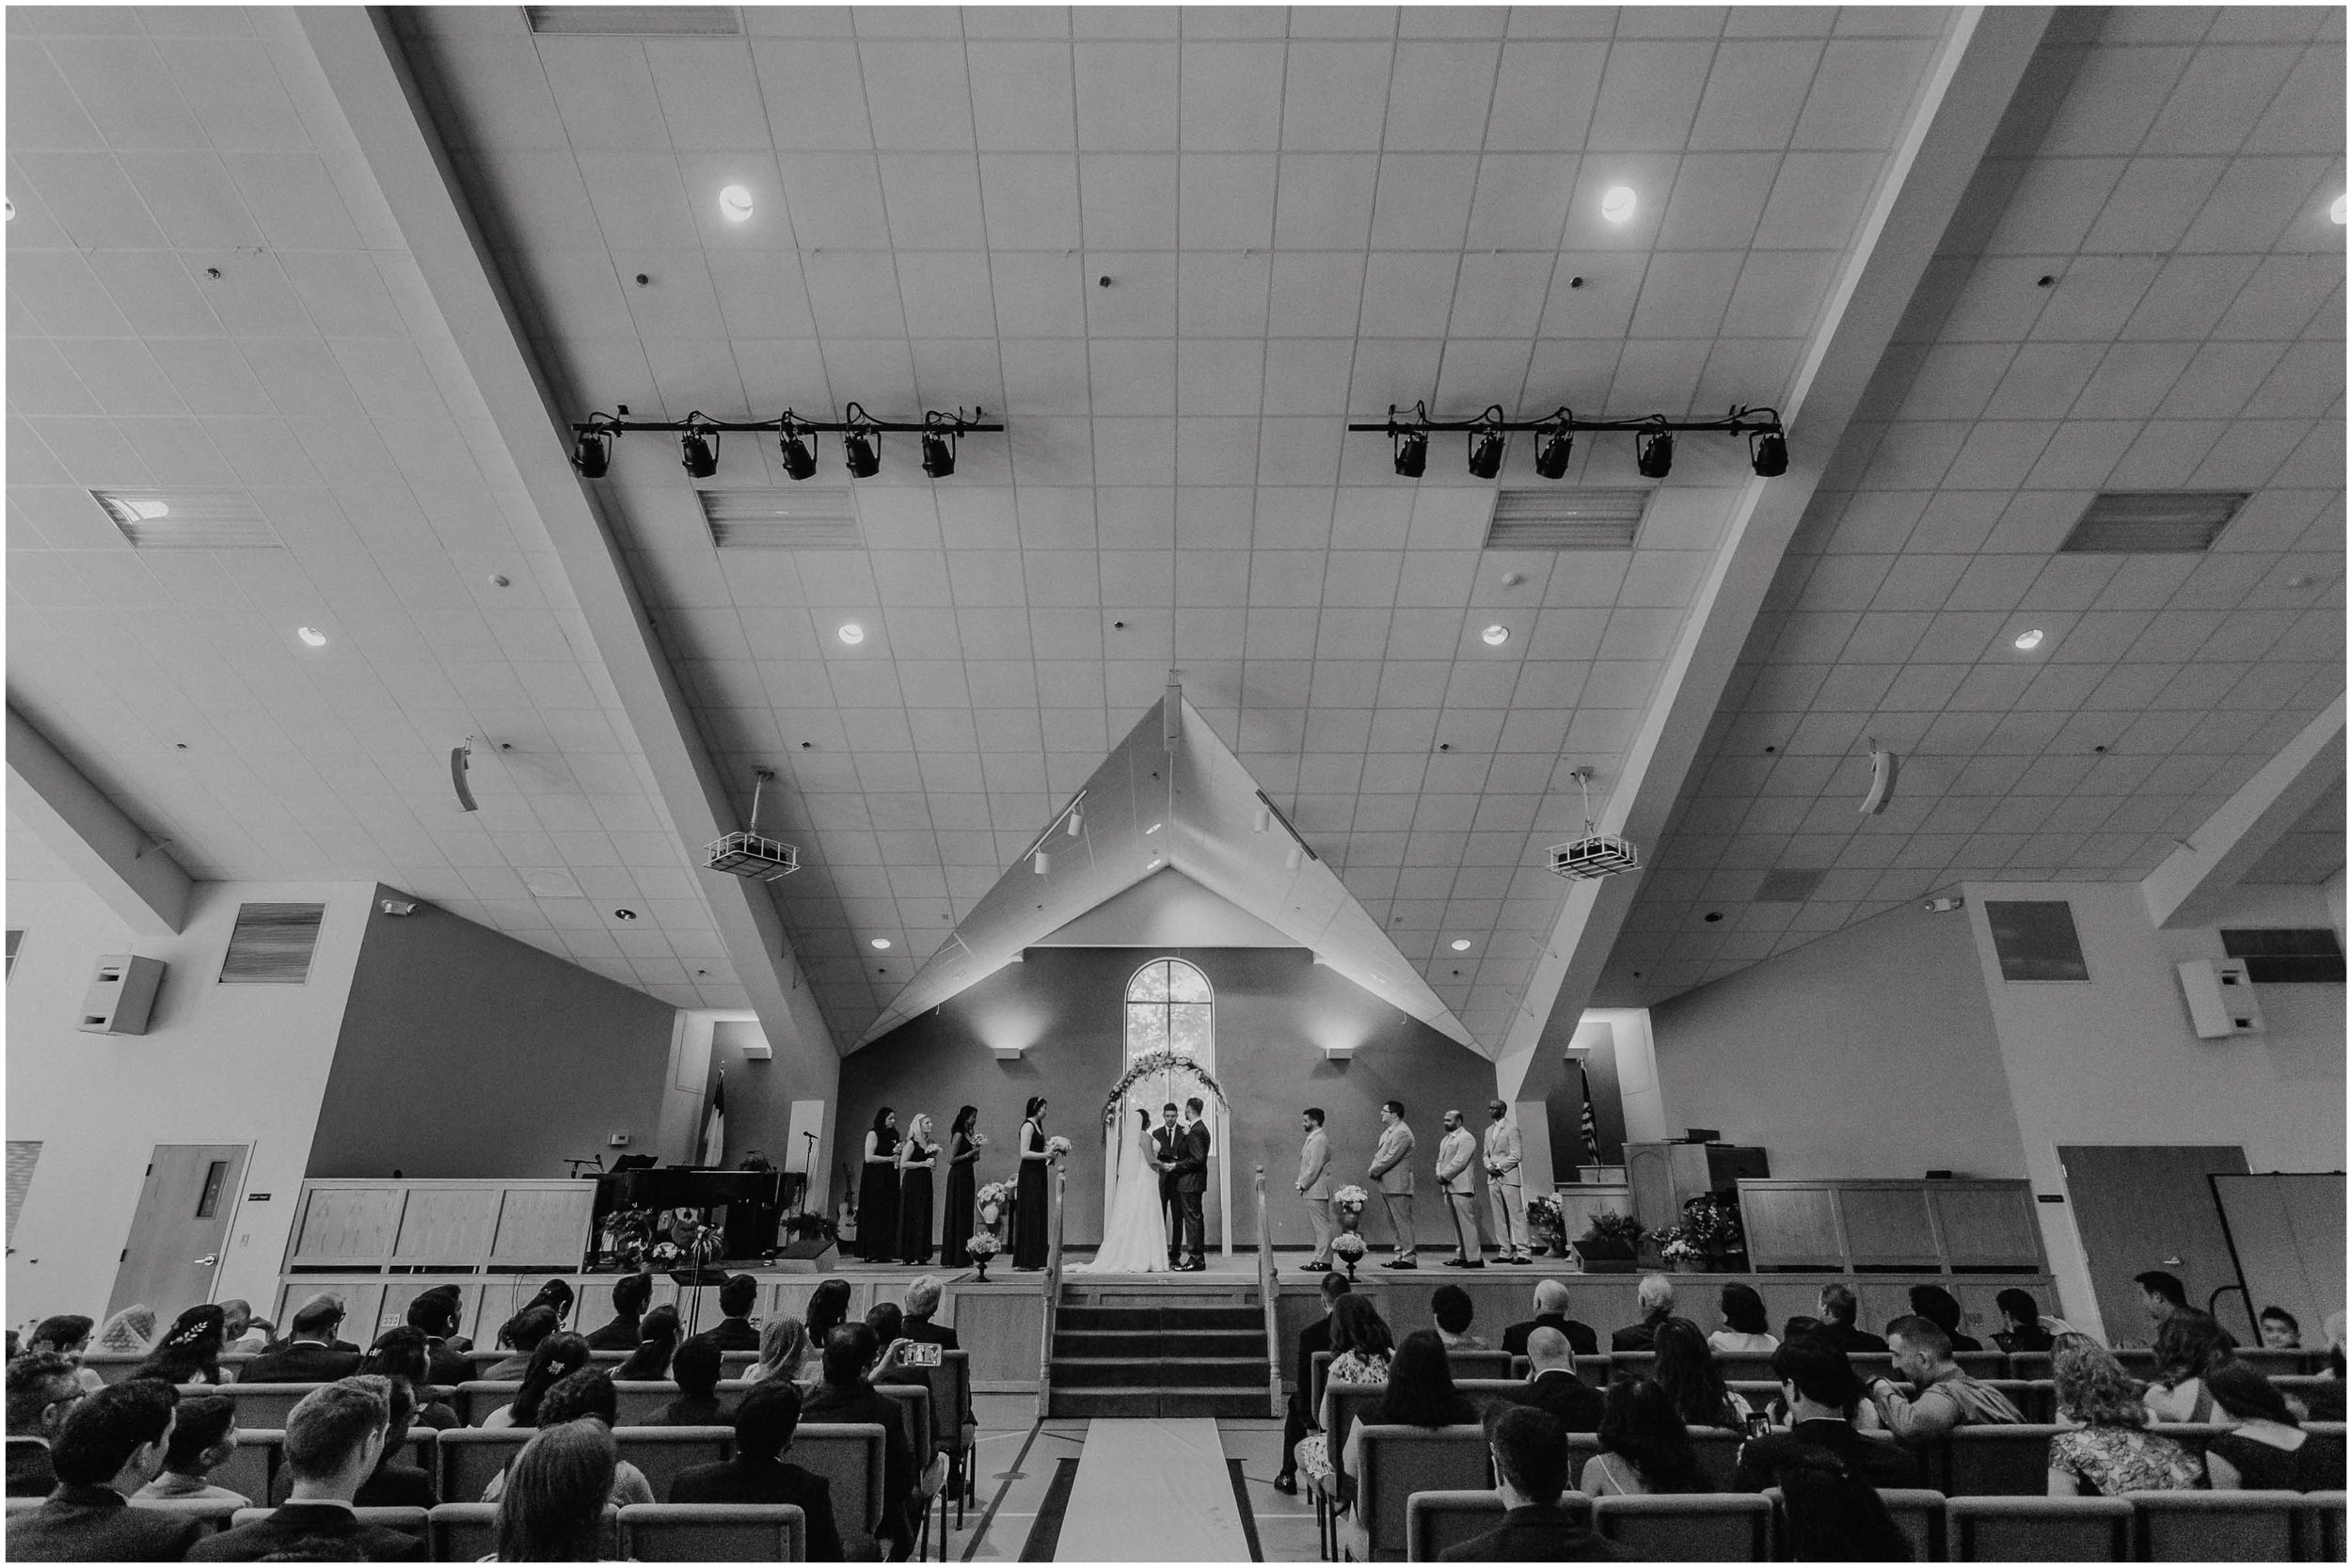 NH wedding photography, NH wedding photographer, wedding photographer NH, wedding photographers NH, wedding photography NH, NH church wedding, Merrimack Valley Baptist Church